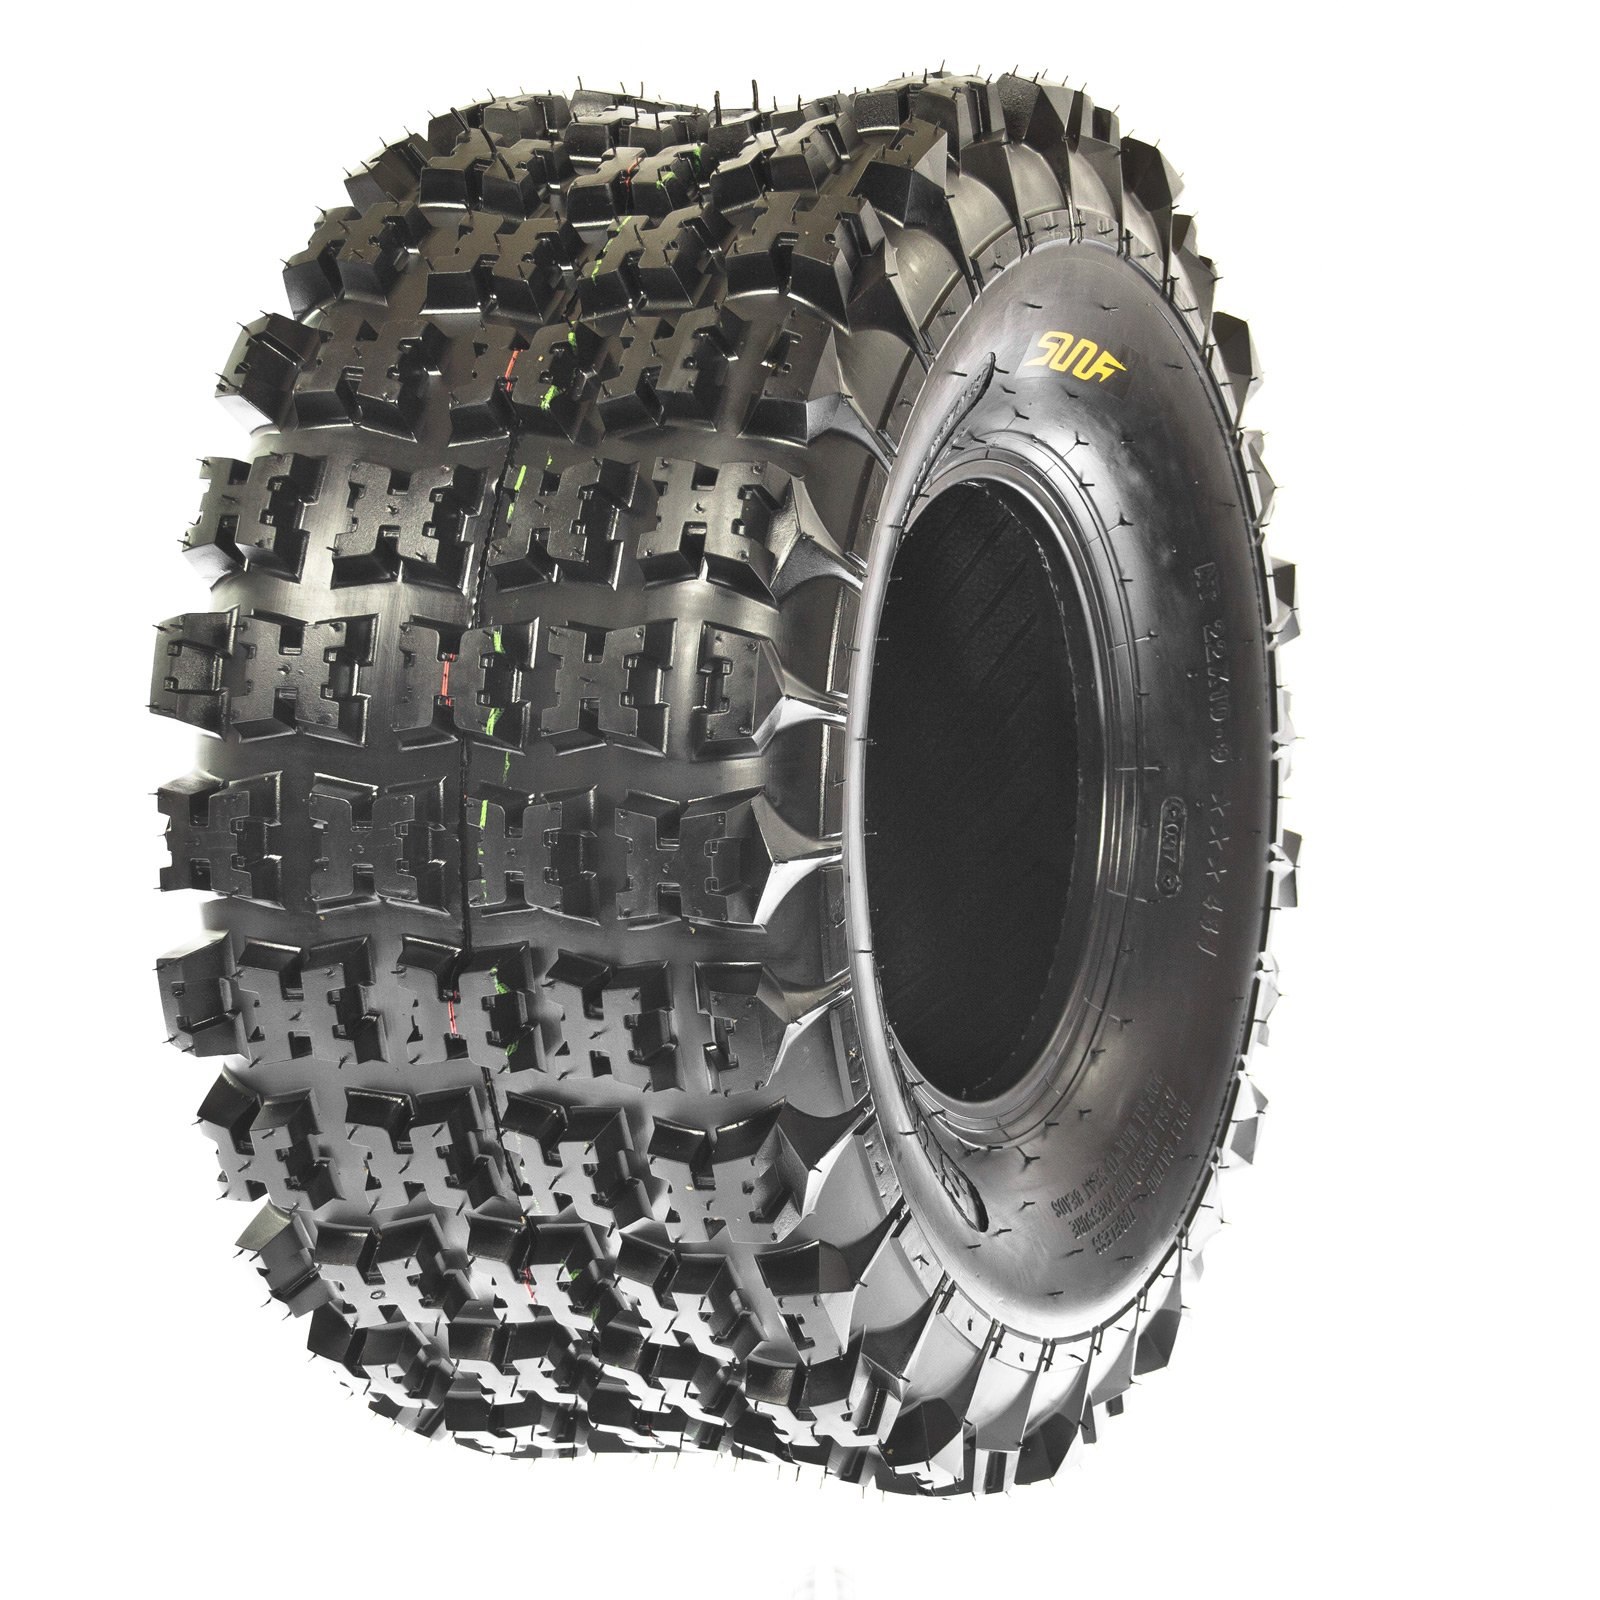 Set of 2 SunF A027 ATV Tire 22x11-9 Rear, 6 Ply by SunF (Image #3)